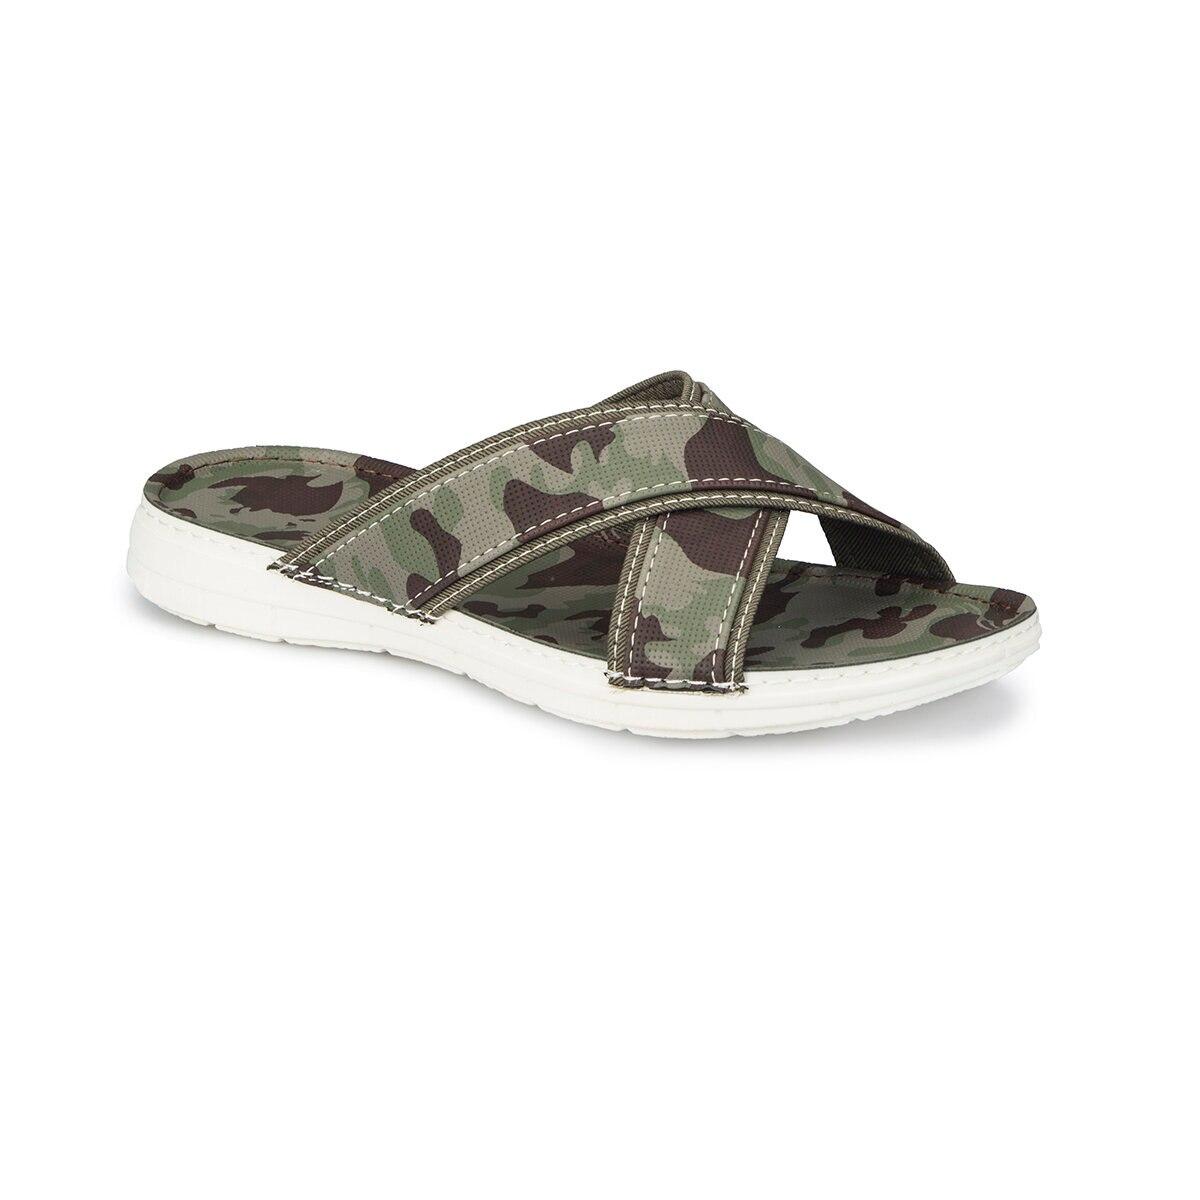 FLO 81.452293.M Green Male Slippers Polaris